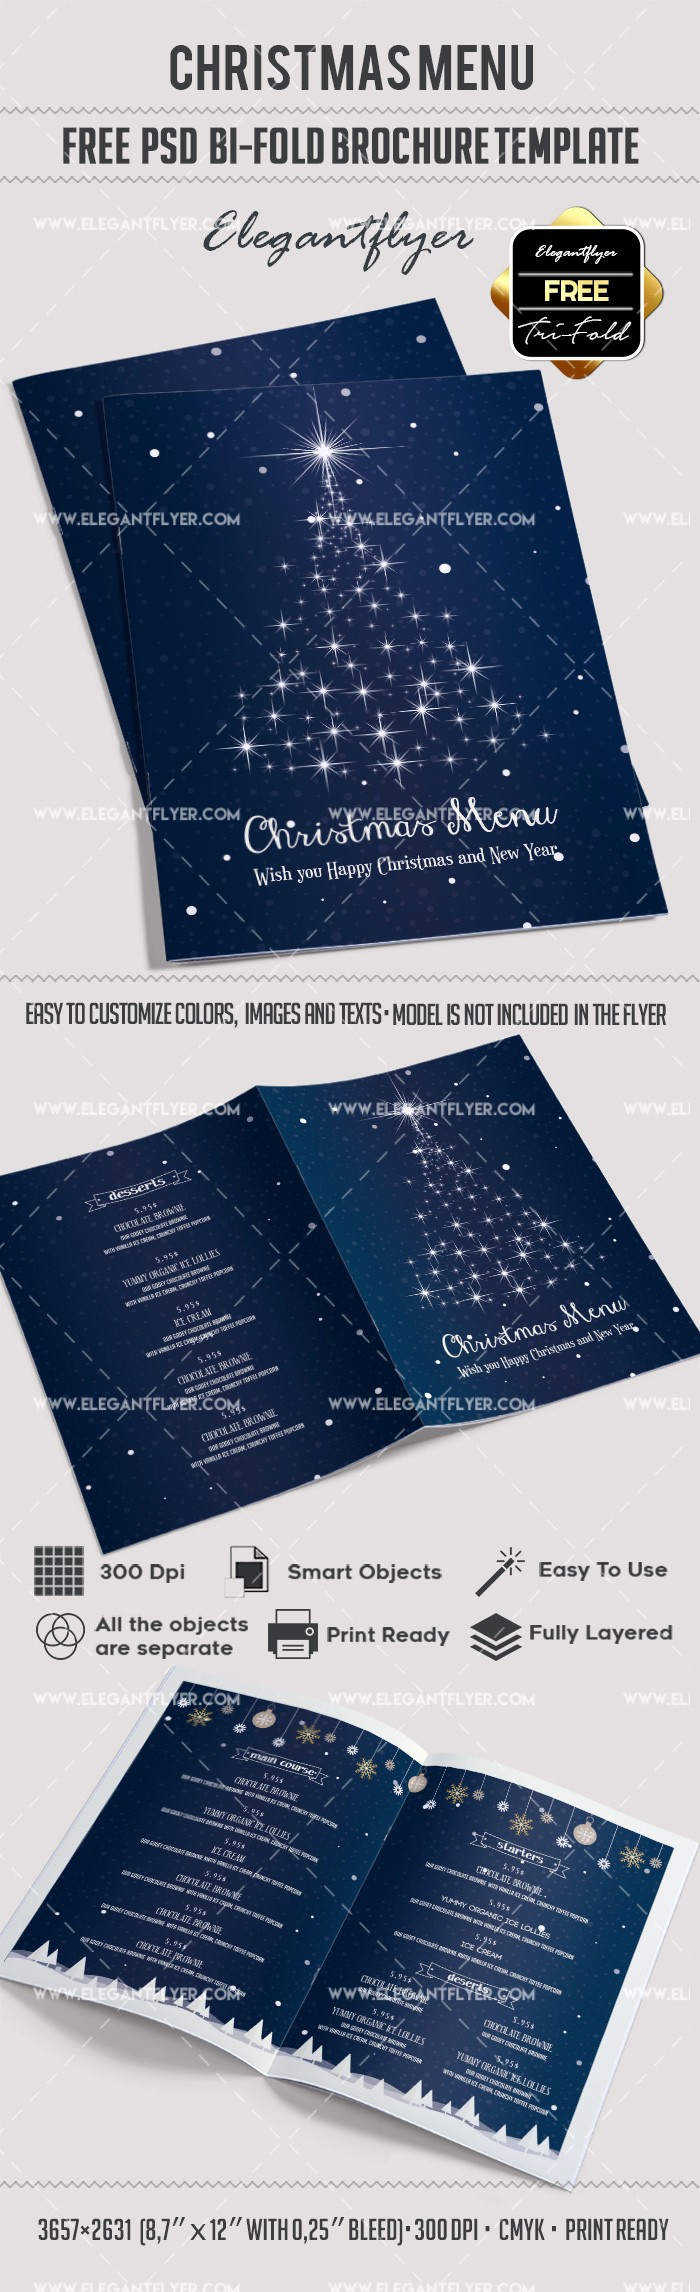 Bi Fold Brochure Templates Free Lovely Free Christmas Menu – Bi Fold Psd Brochure Template – by